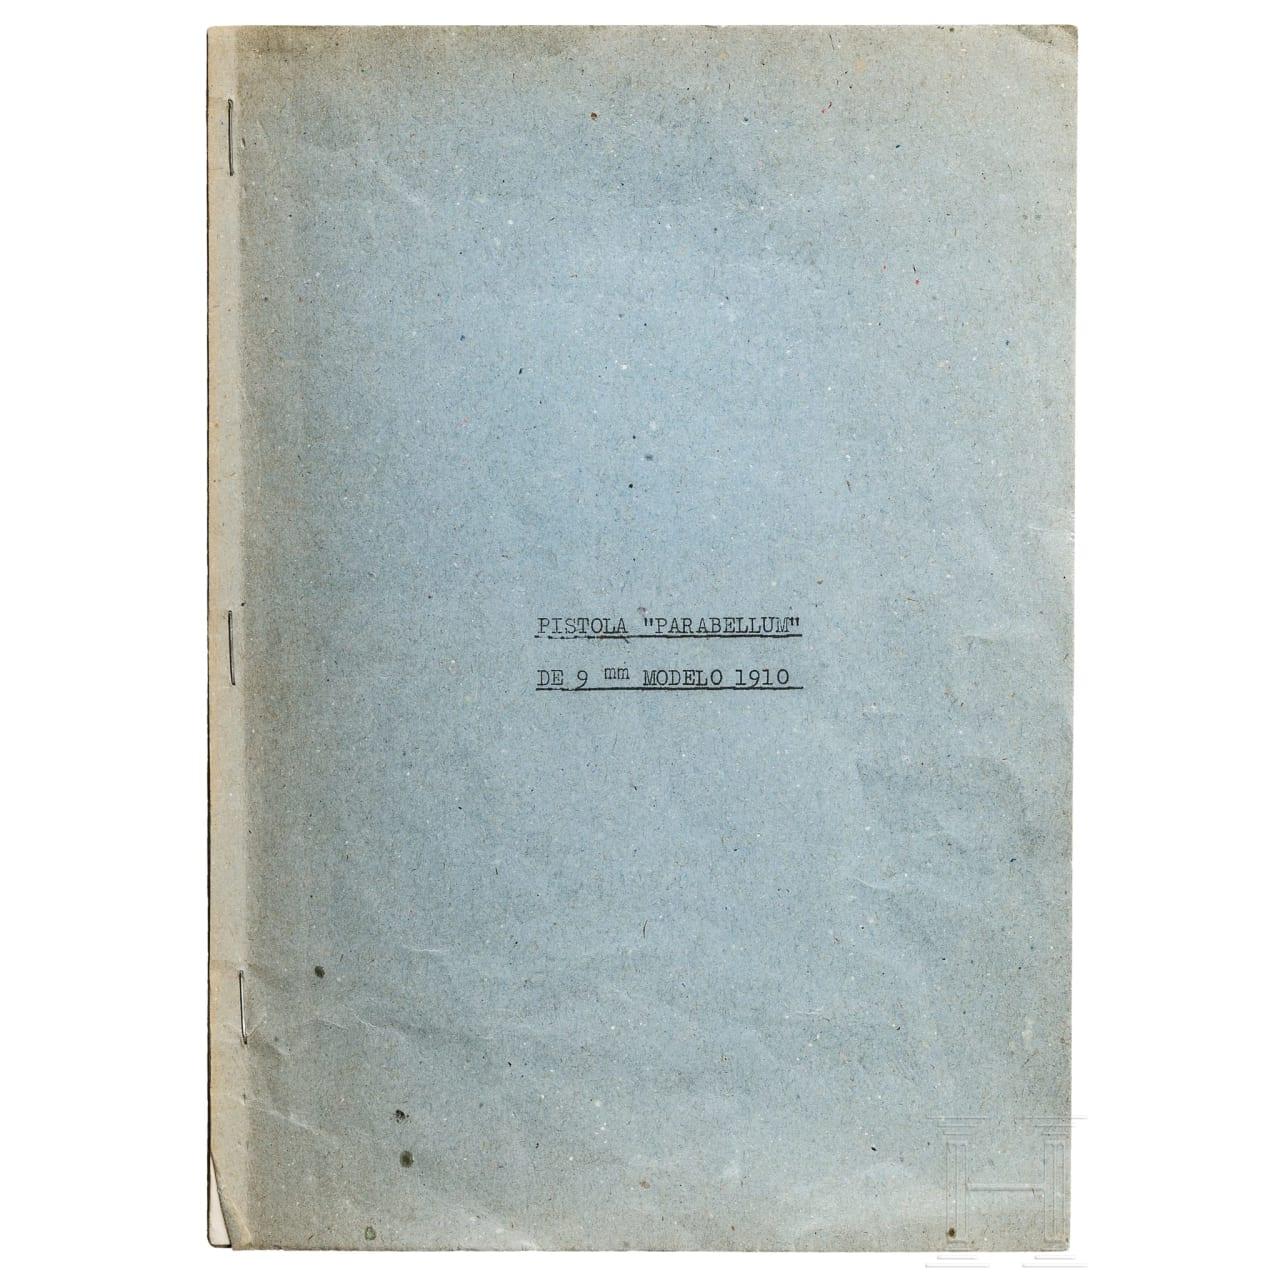 Originale prov. Anleitung zur Pistole Parabellum Mod. 1910, Portugal